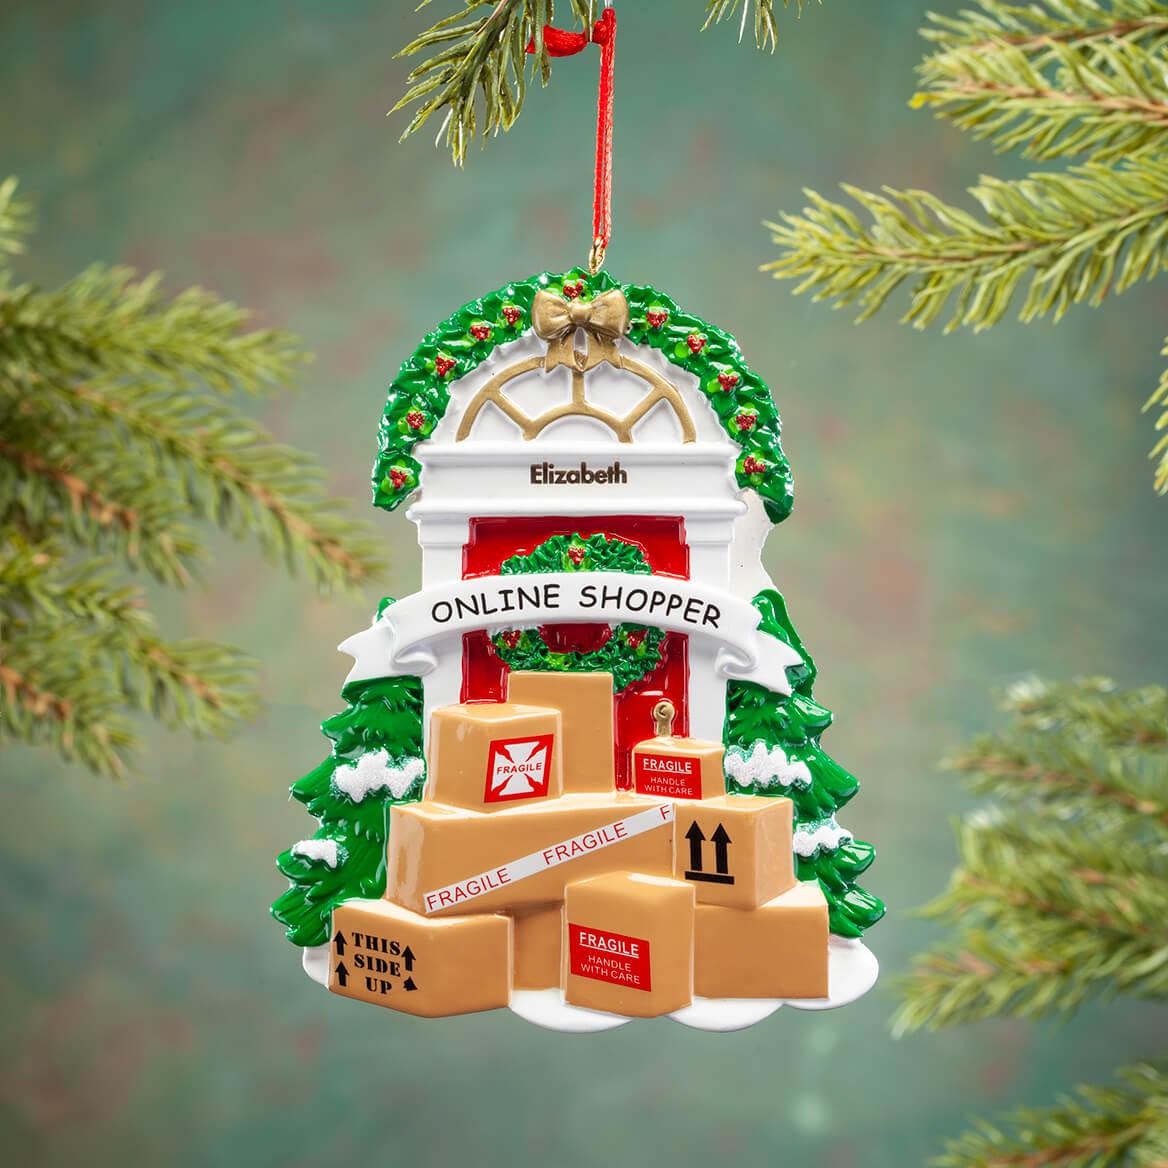 Personalized Online Shopper Ornament-368534